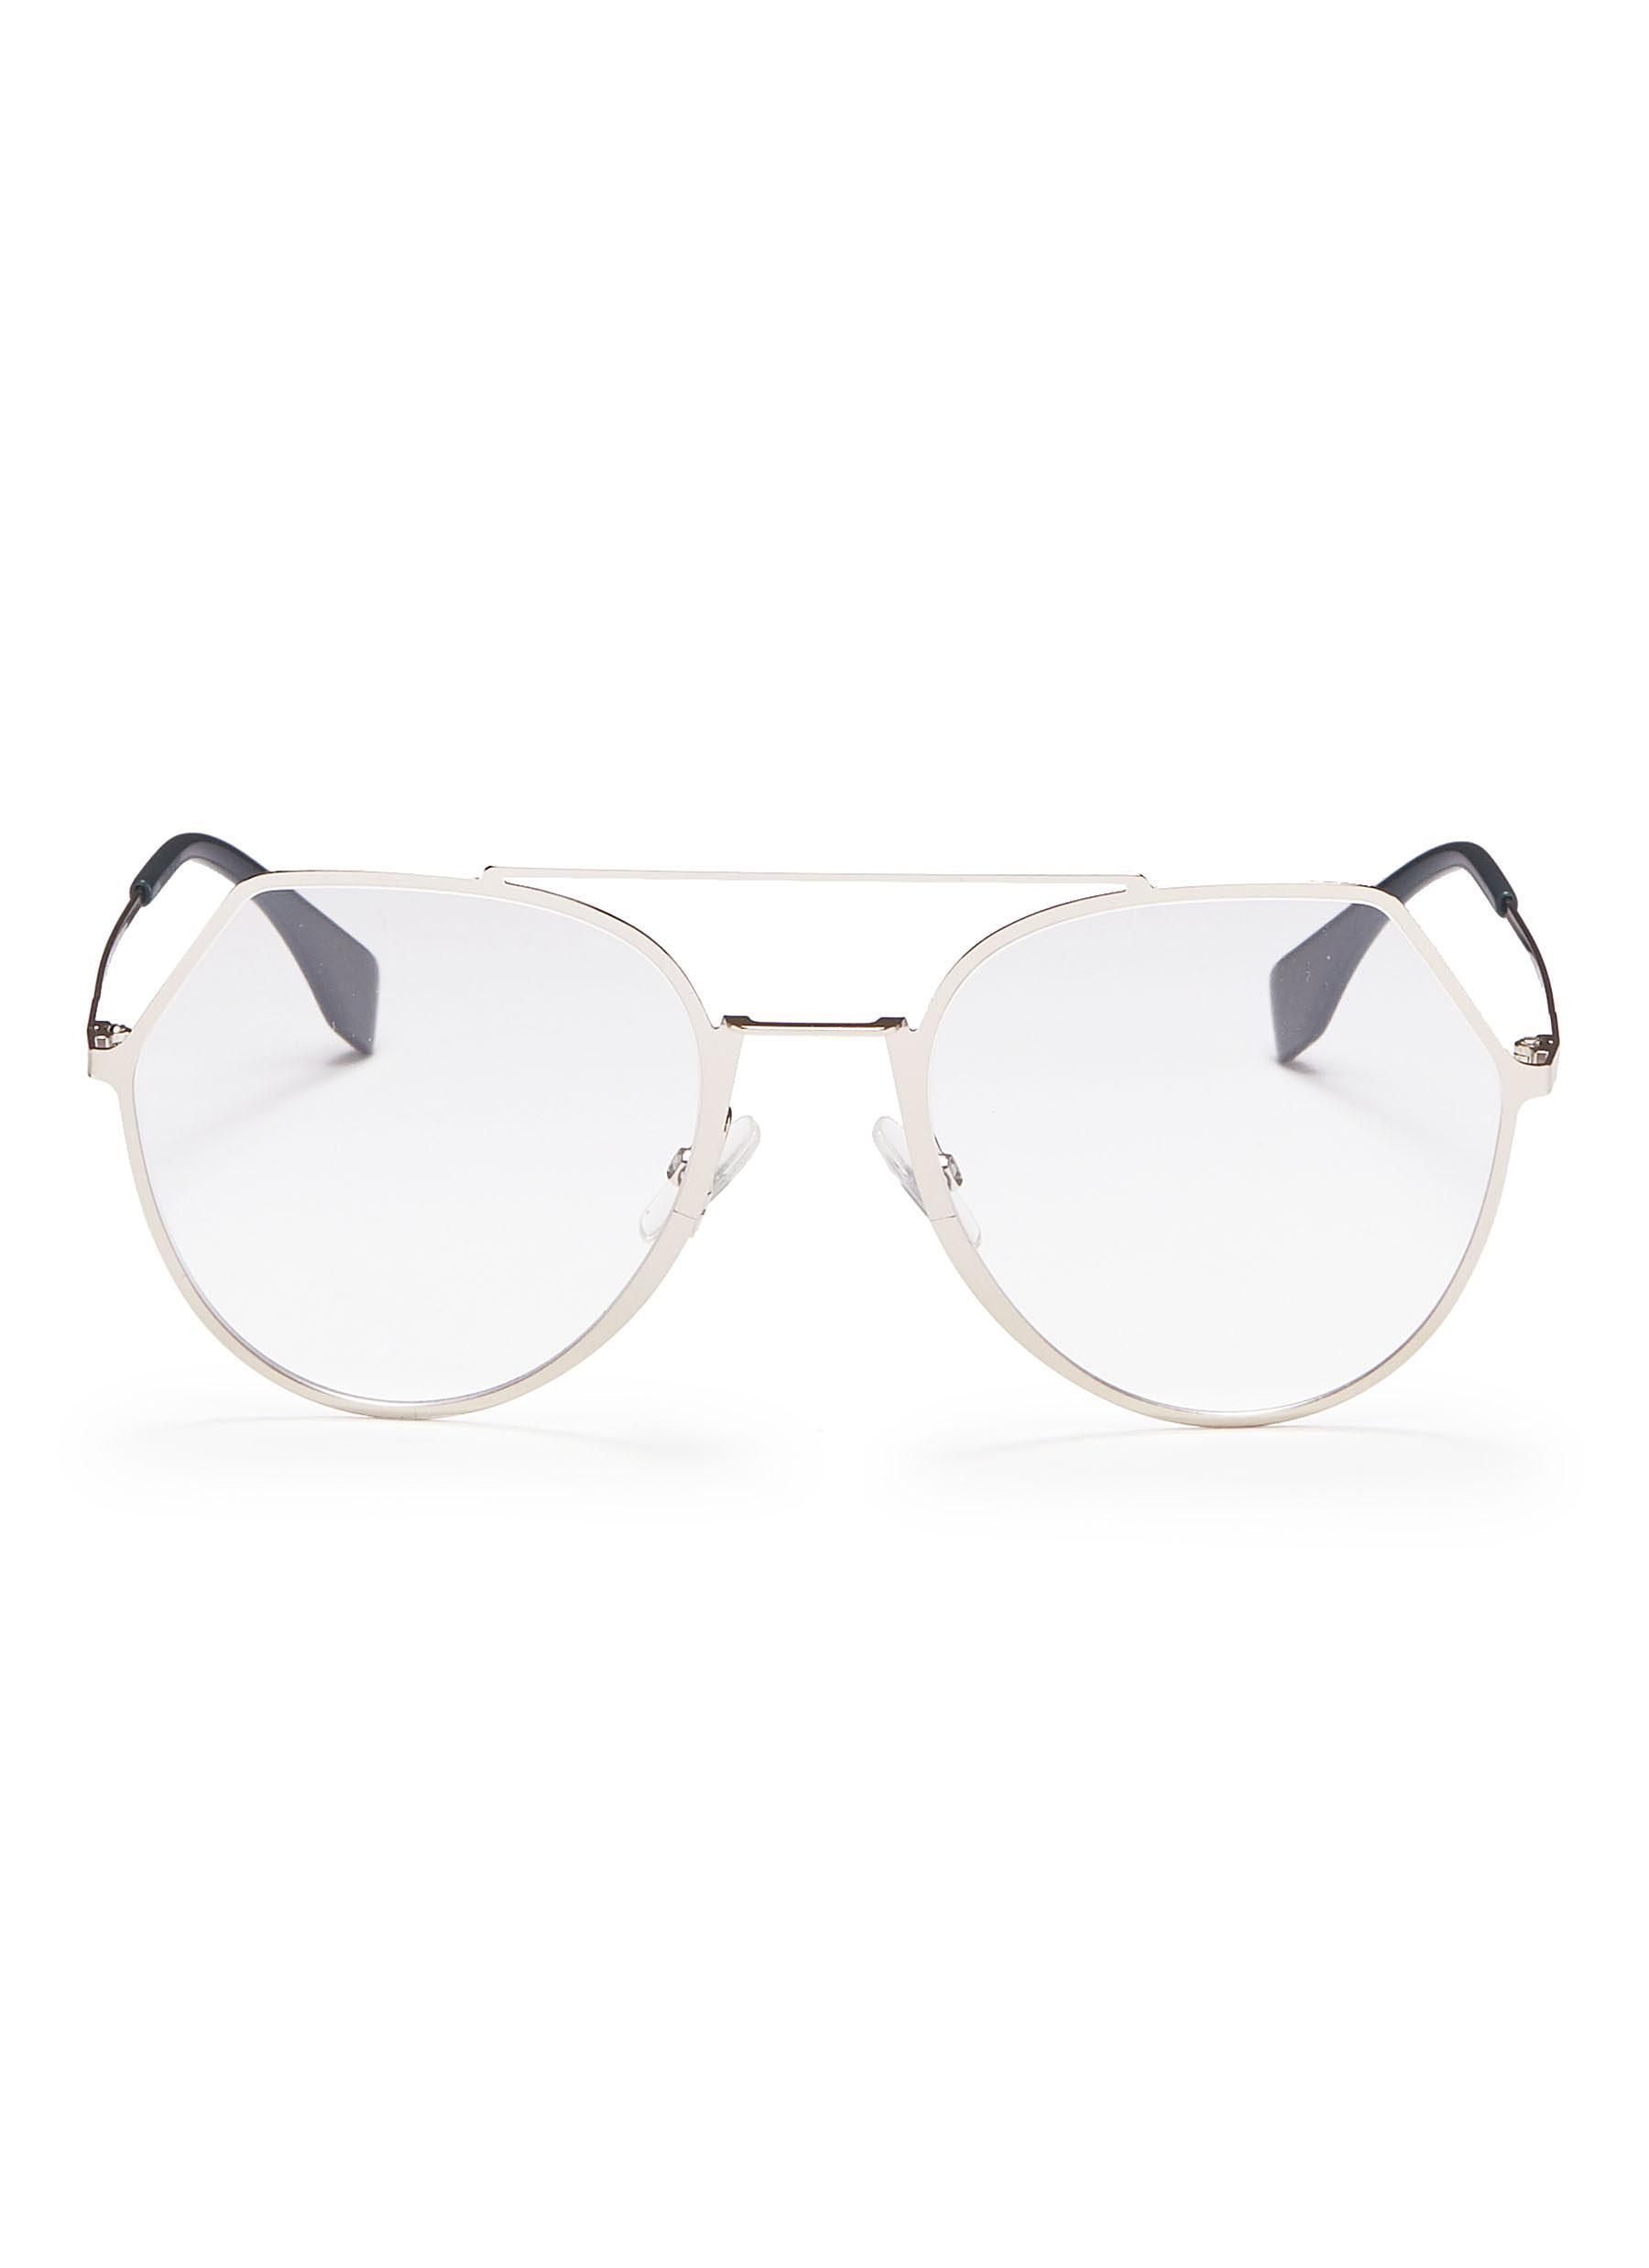 d7820dfcc2 Main View - Click To Enlarge - Fendi - Metal angular aviator optical glasses